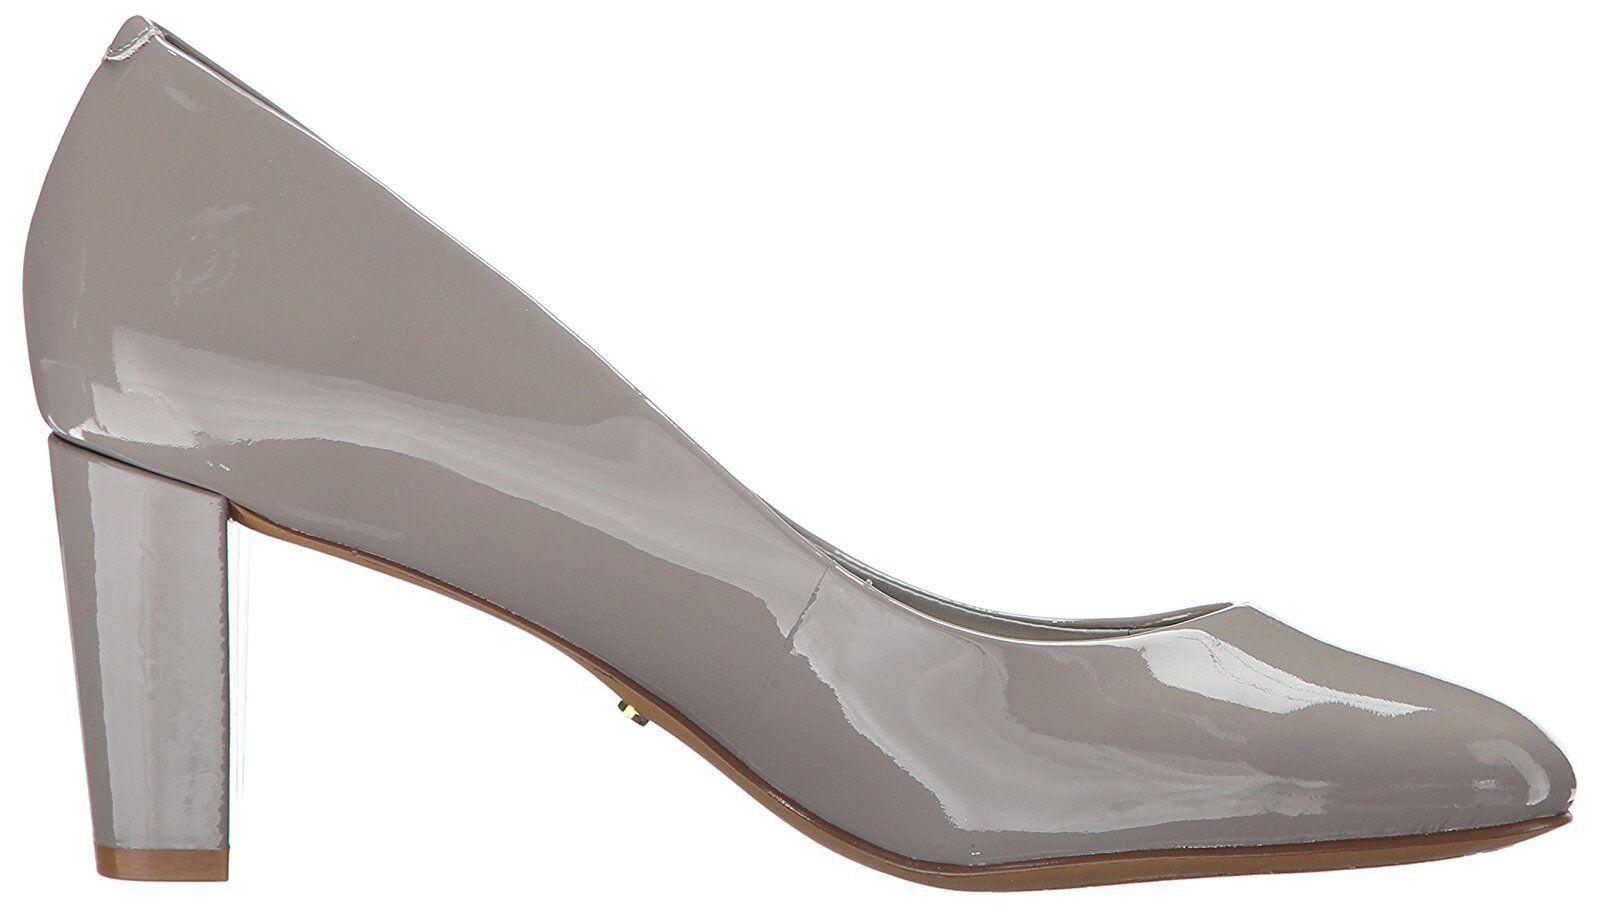 Ralph Closed Lauren Damenschuhe Hala Stone Claret Leder Closed Ralph Toe Damens Schuhes Pump 3c2cc6